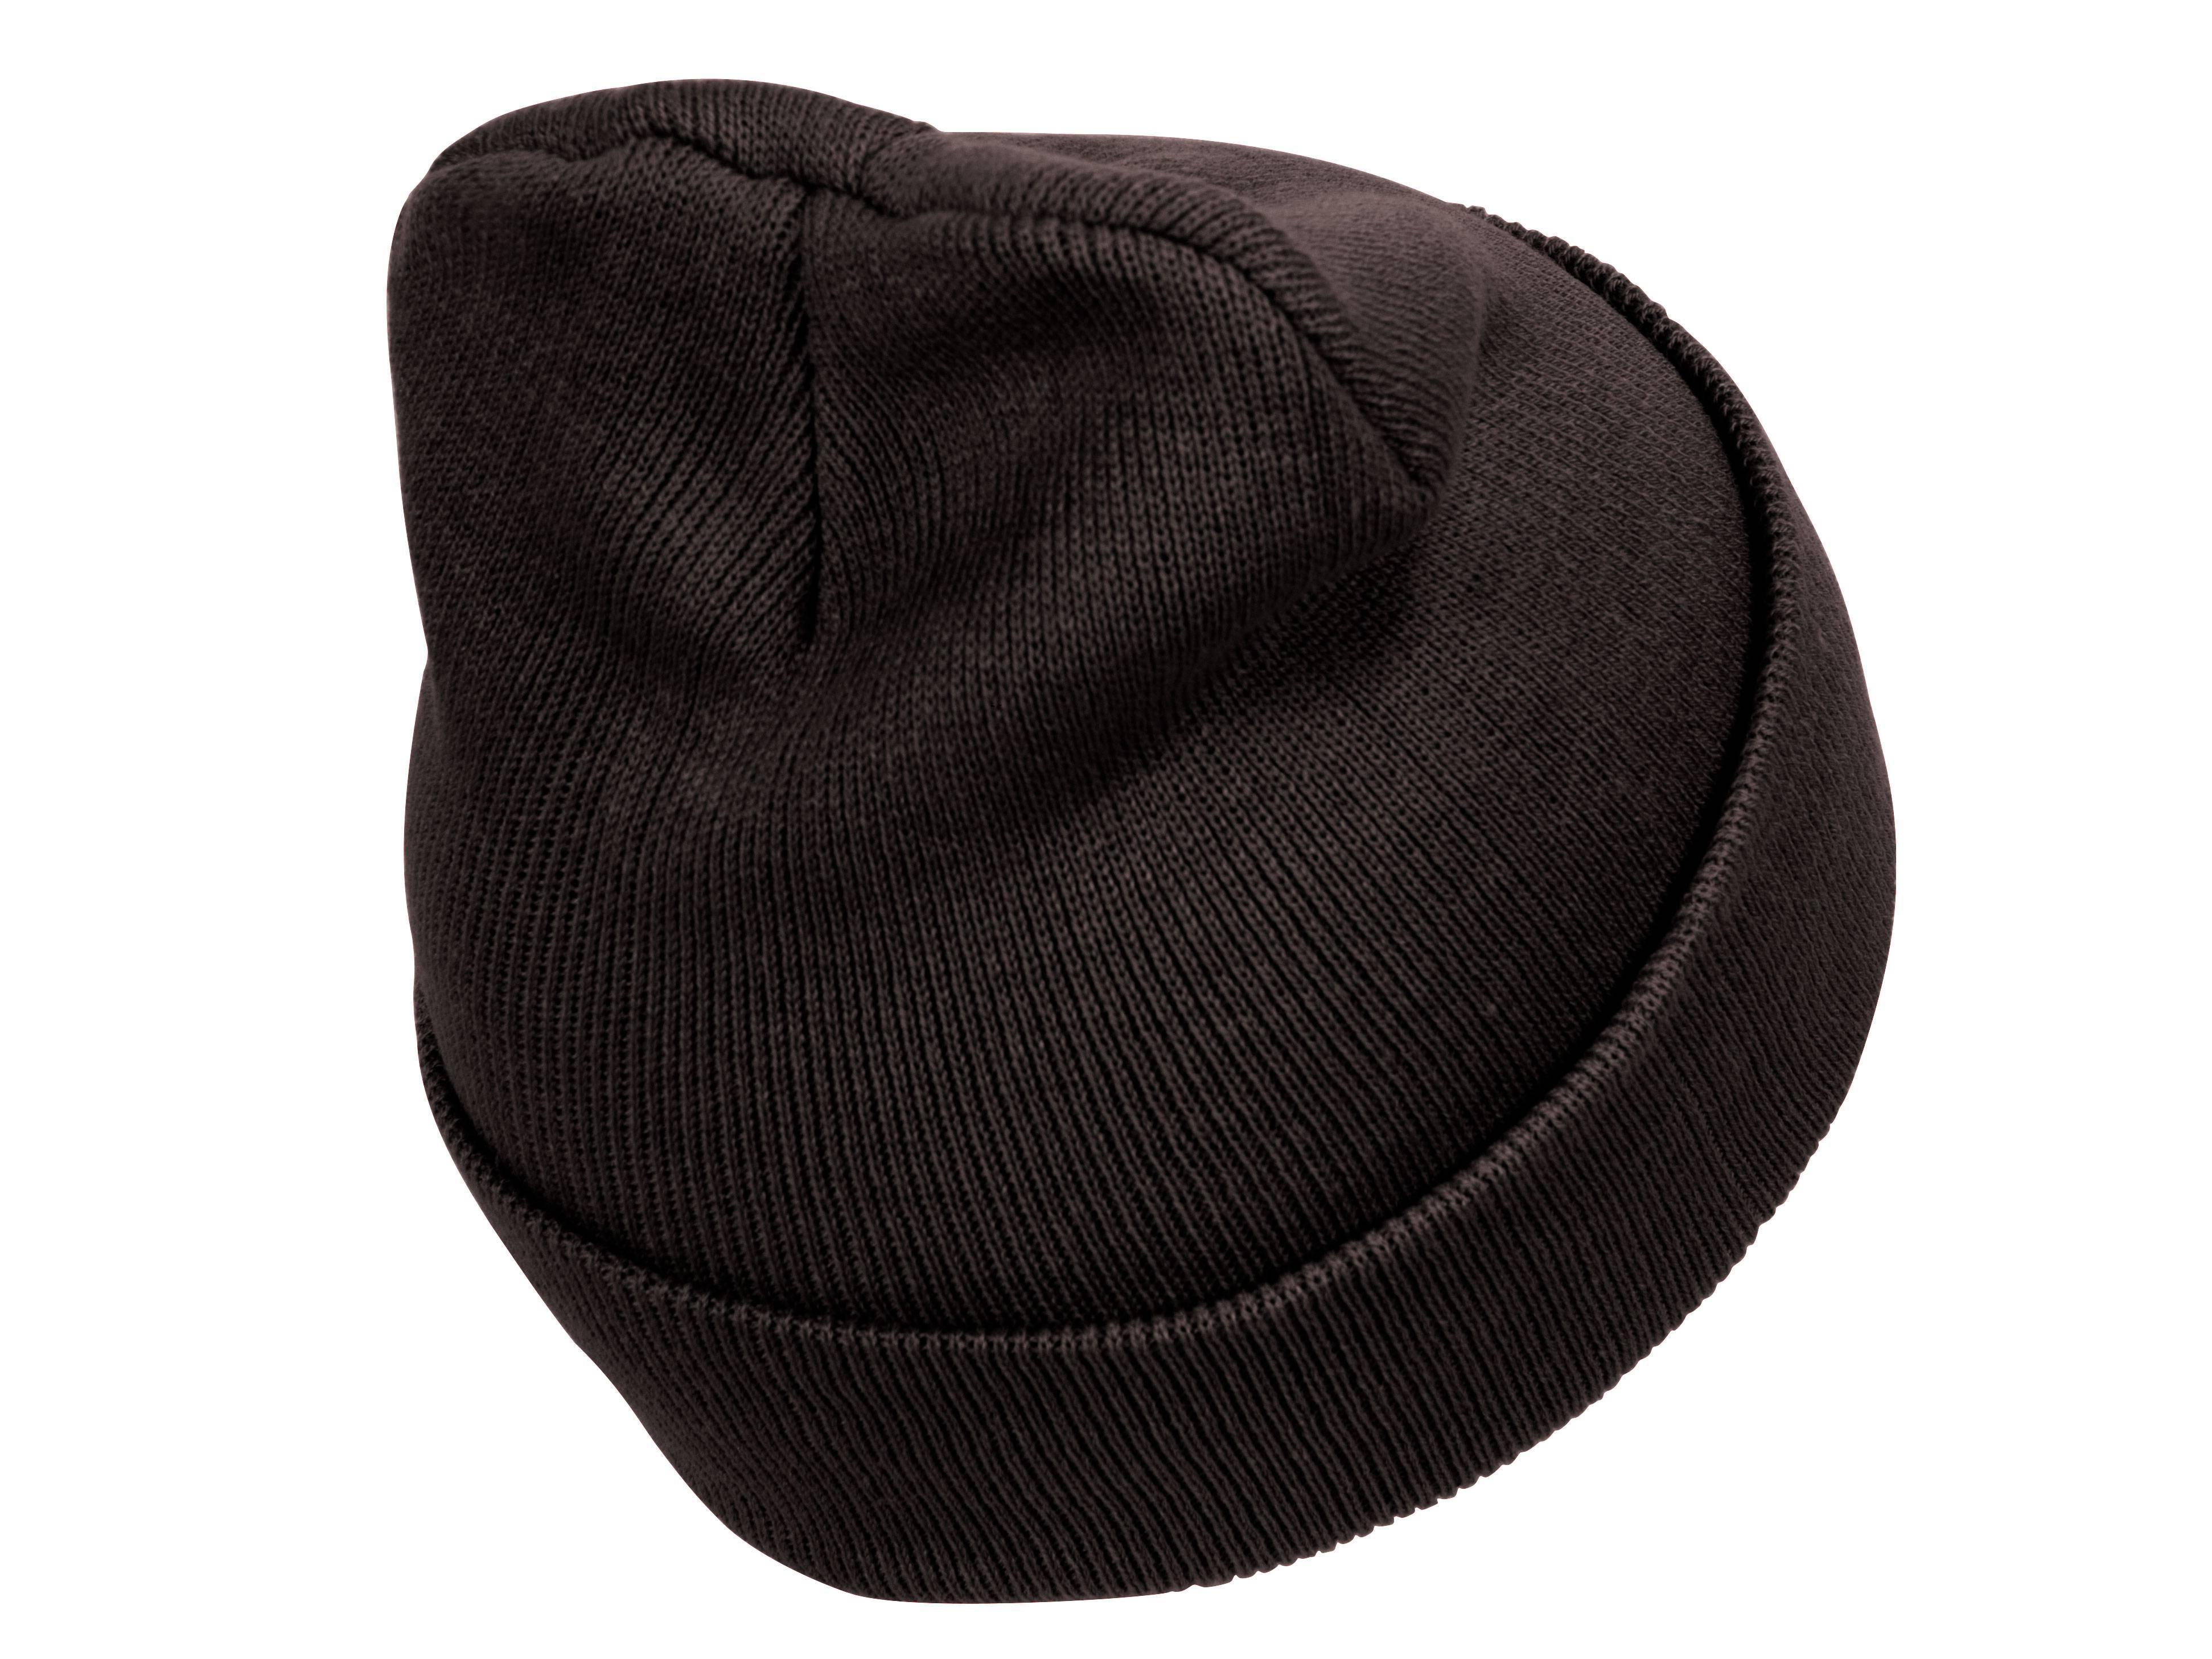 thumbnail 7 - Top Headwear Solid Winter Long Beanie - 12 Piece Wholesale